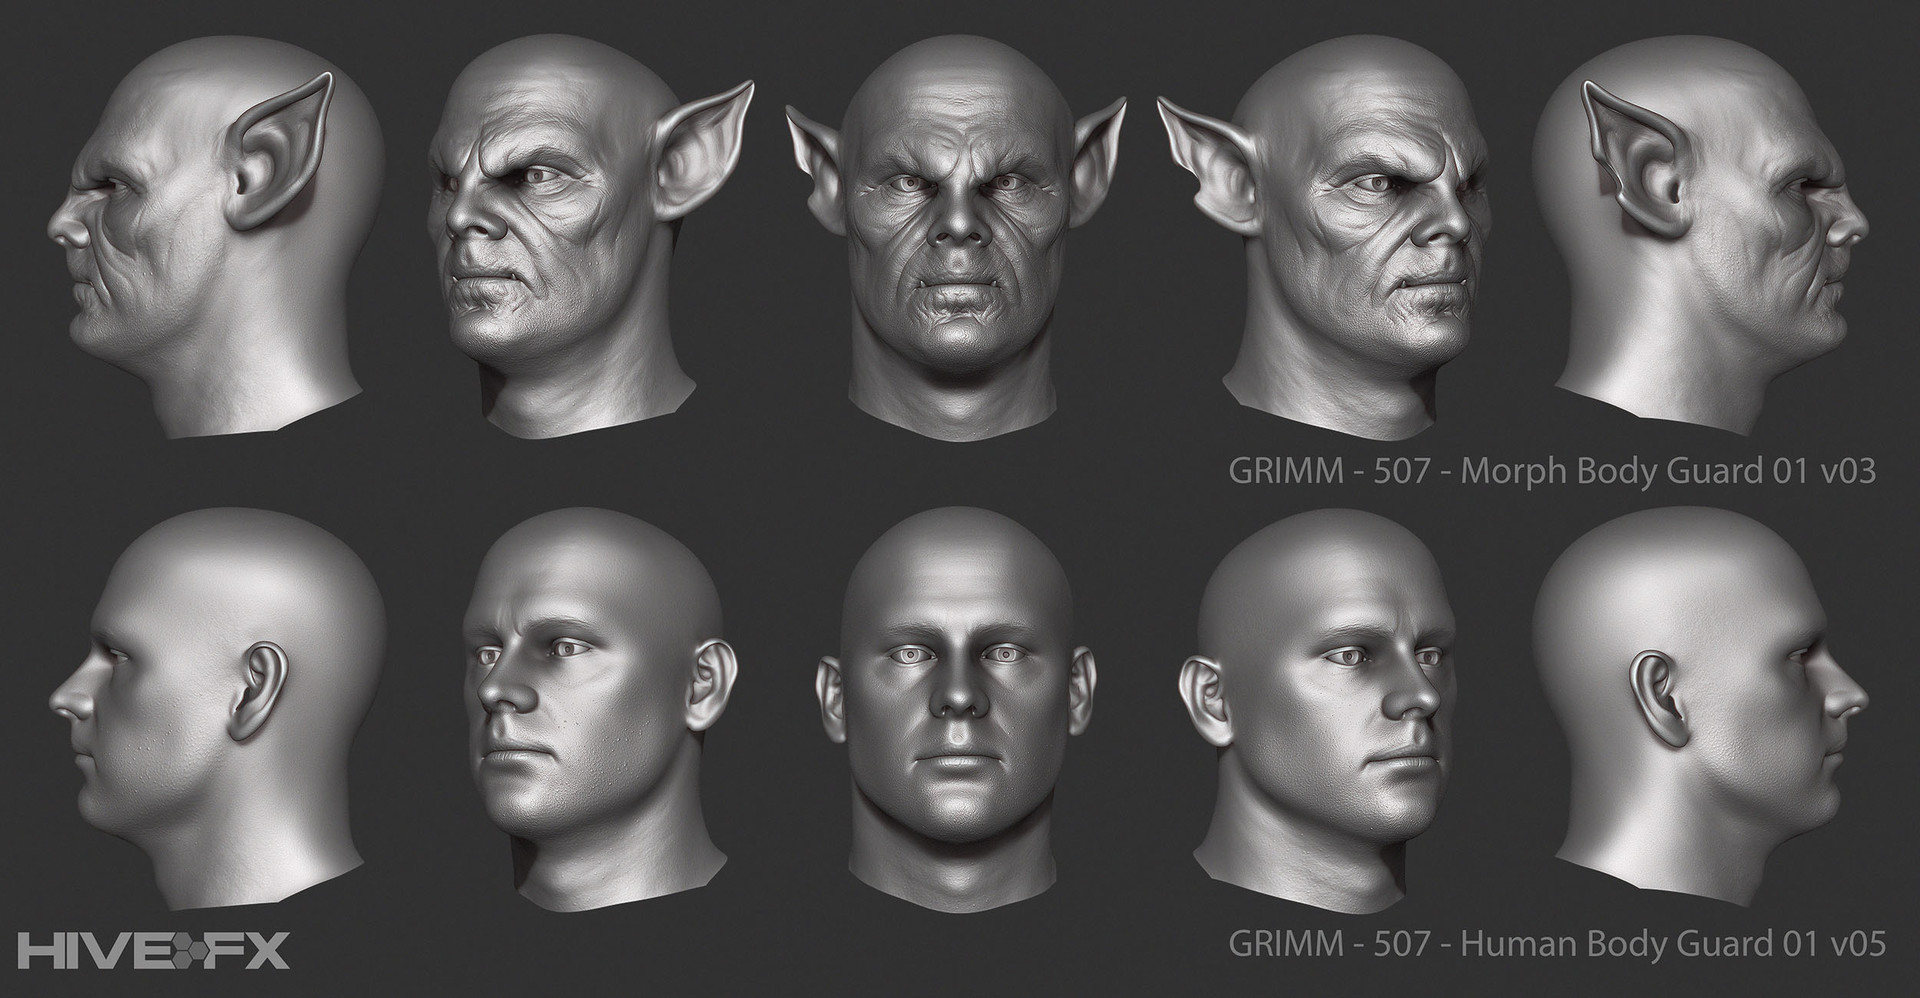 Eric blondin grimm 507 human and morph body guard 01 v05